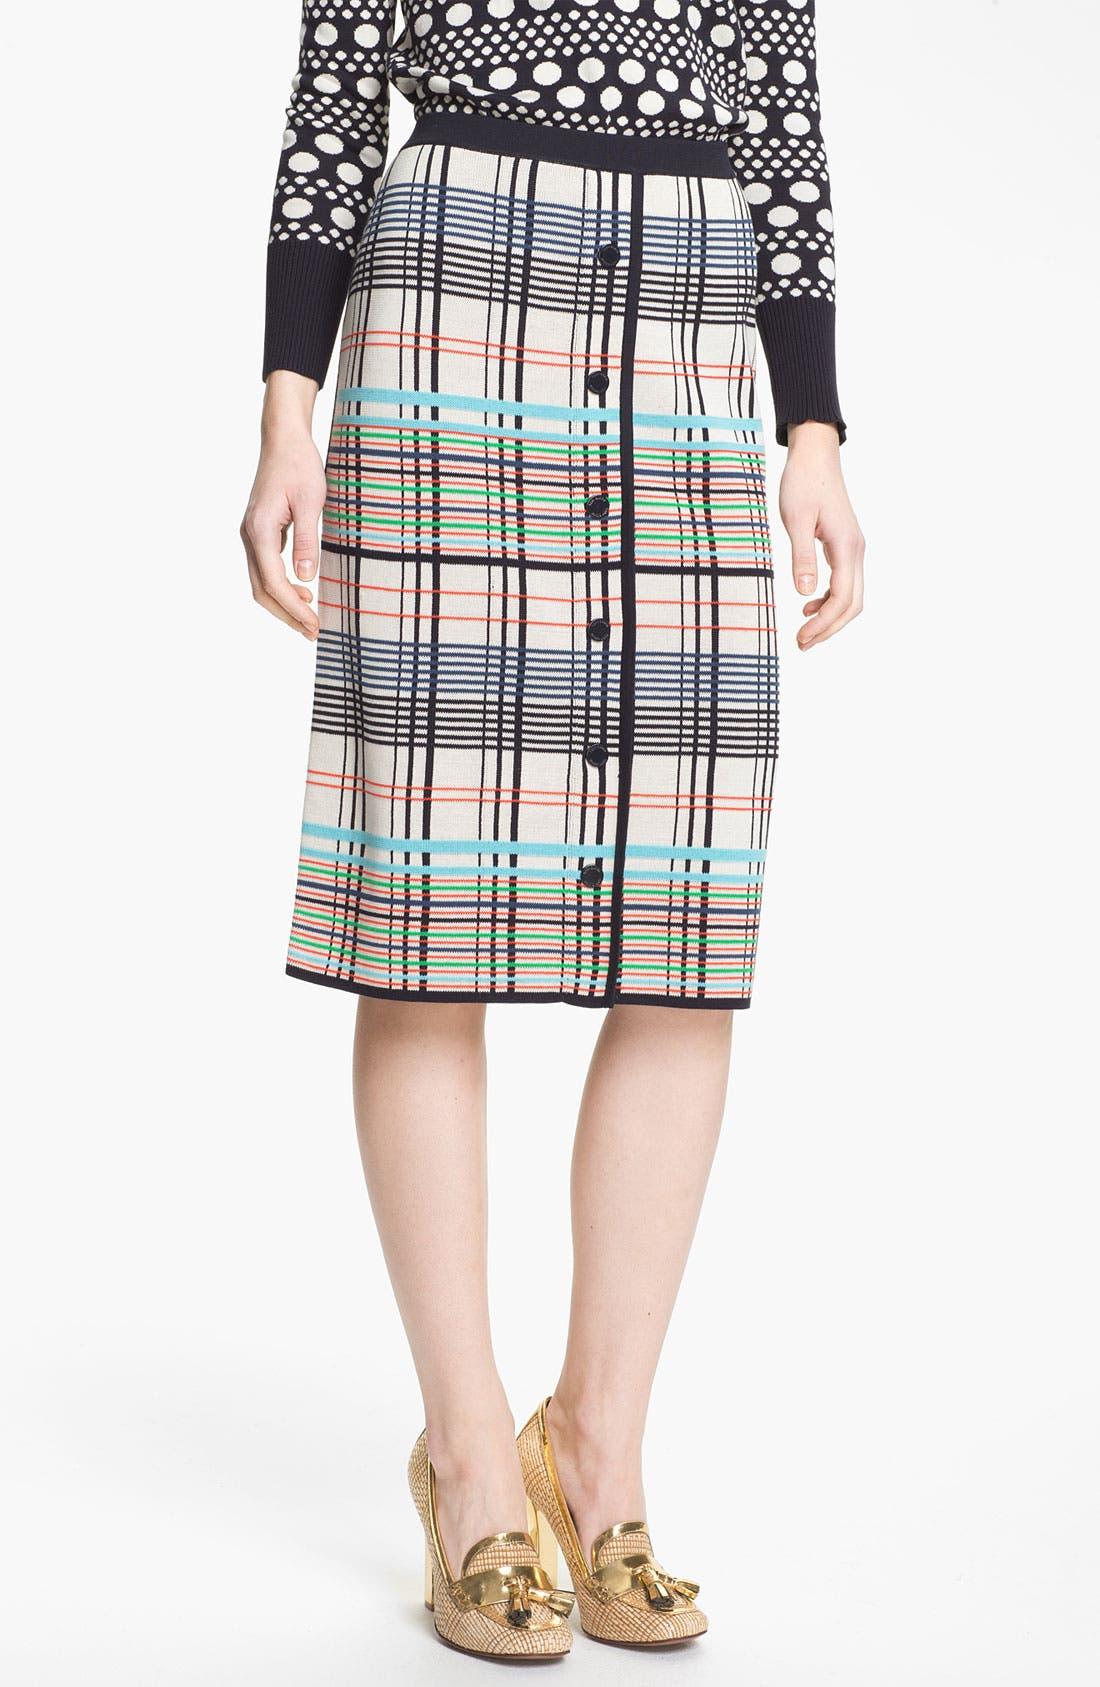 Alternate Image 1 Selected - Tory Burch 'Adalyn' Skirt